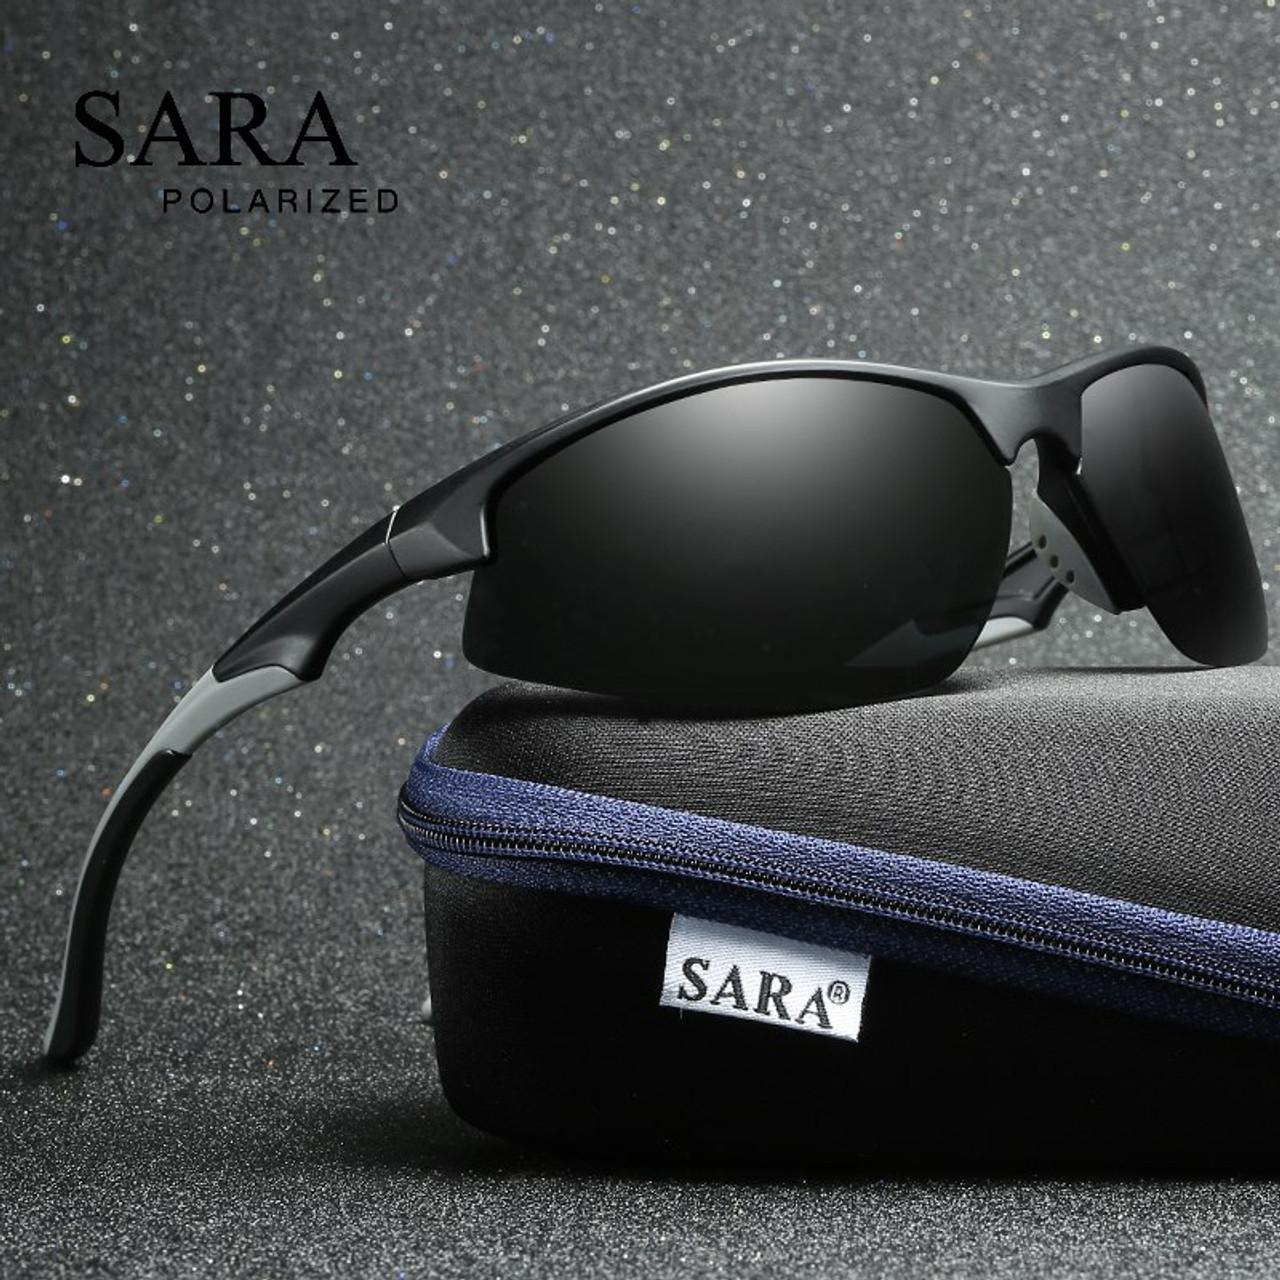 892fc8ff28fa SARA Male Sun Glasses Fashion Sports Polarized Sunglasses For Men Women UV400  Driving Fishing Shades Lenses ...